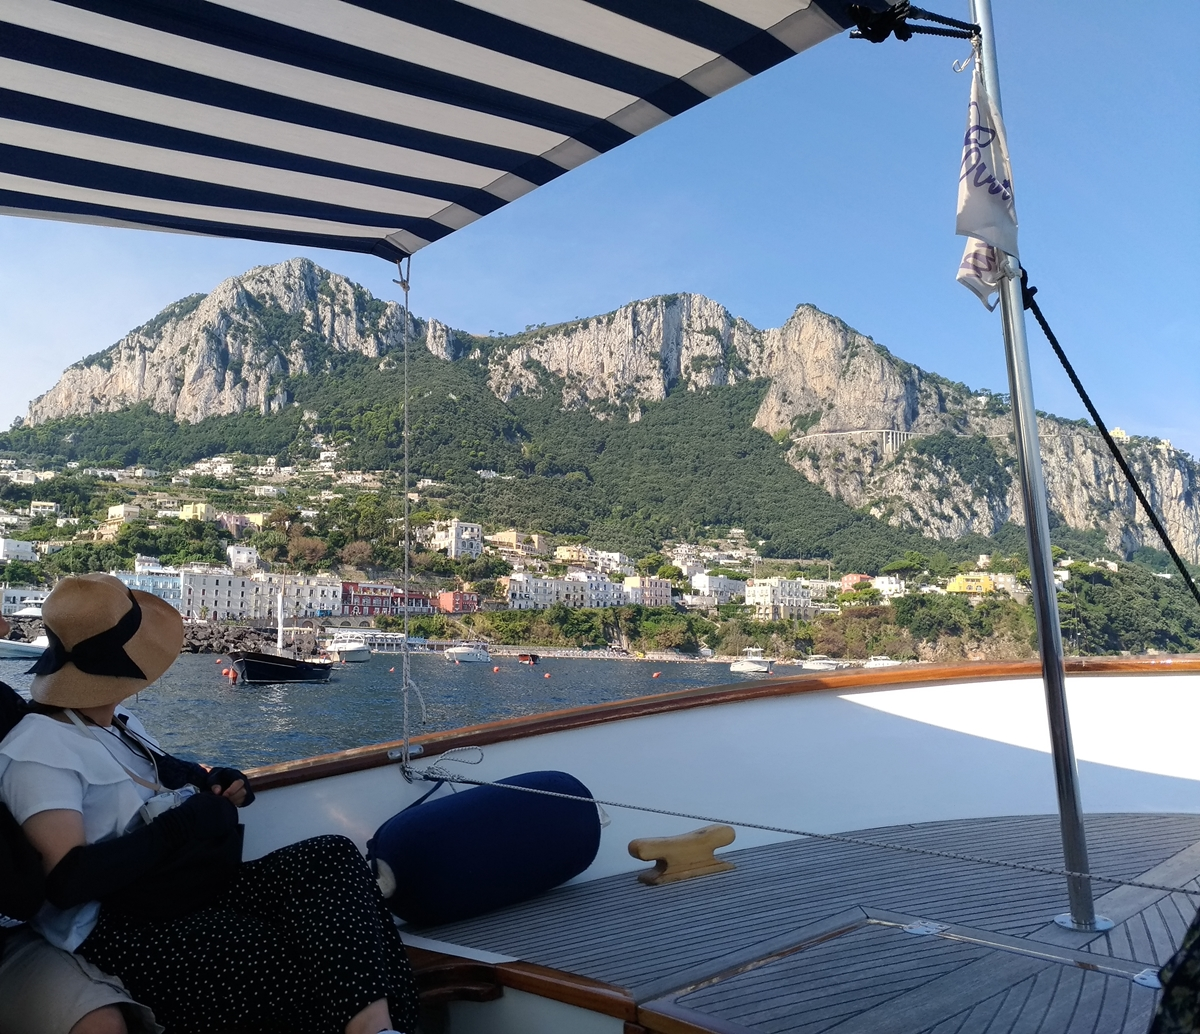 P_20180823_094651(Capri_2nd_boat).jpg